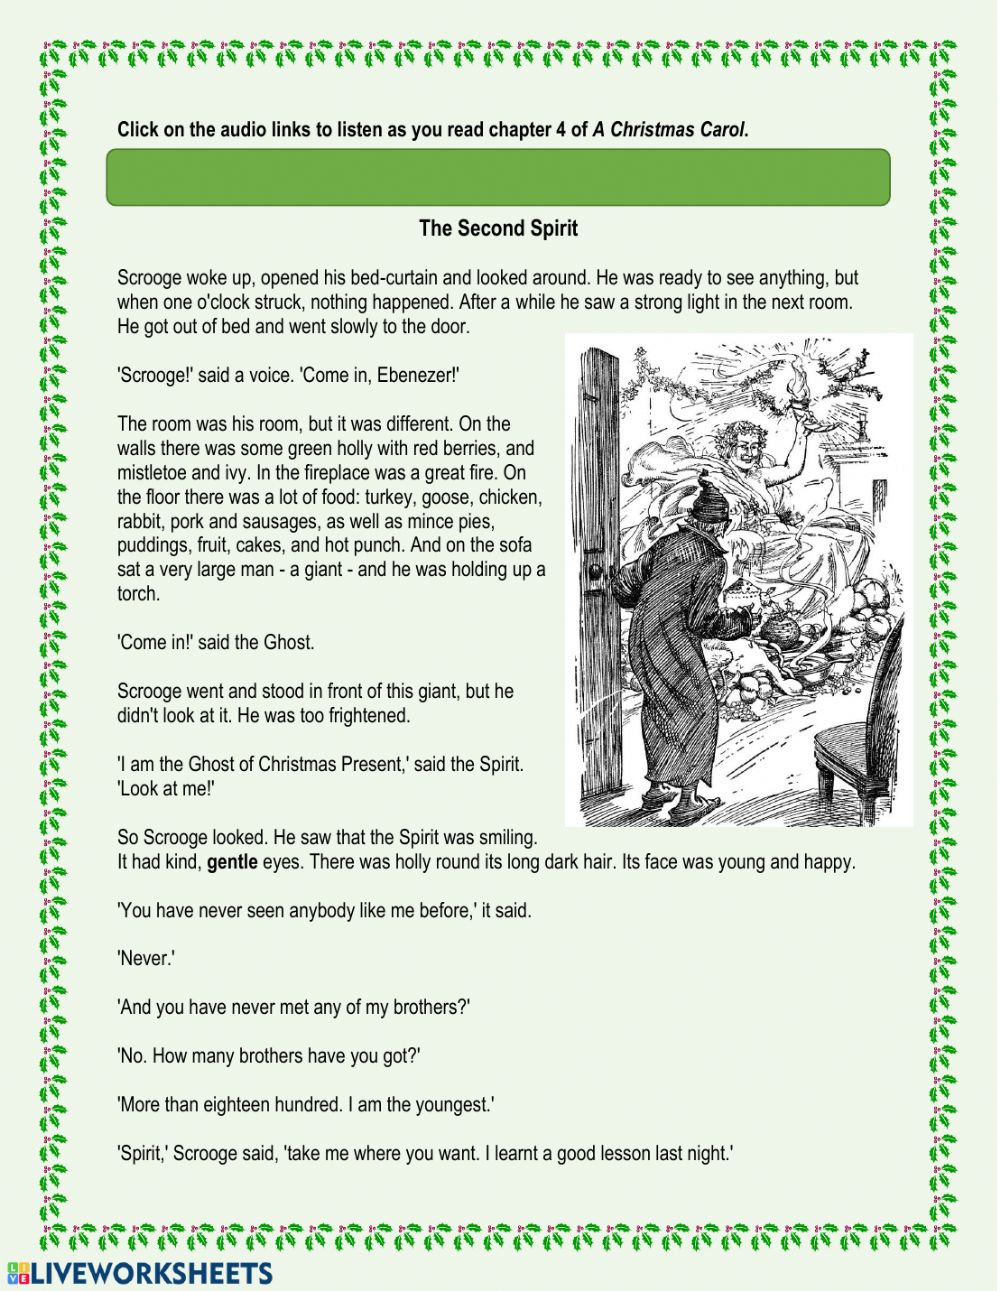 A Christmas Carol - Chapter 4 Worksheet